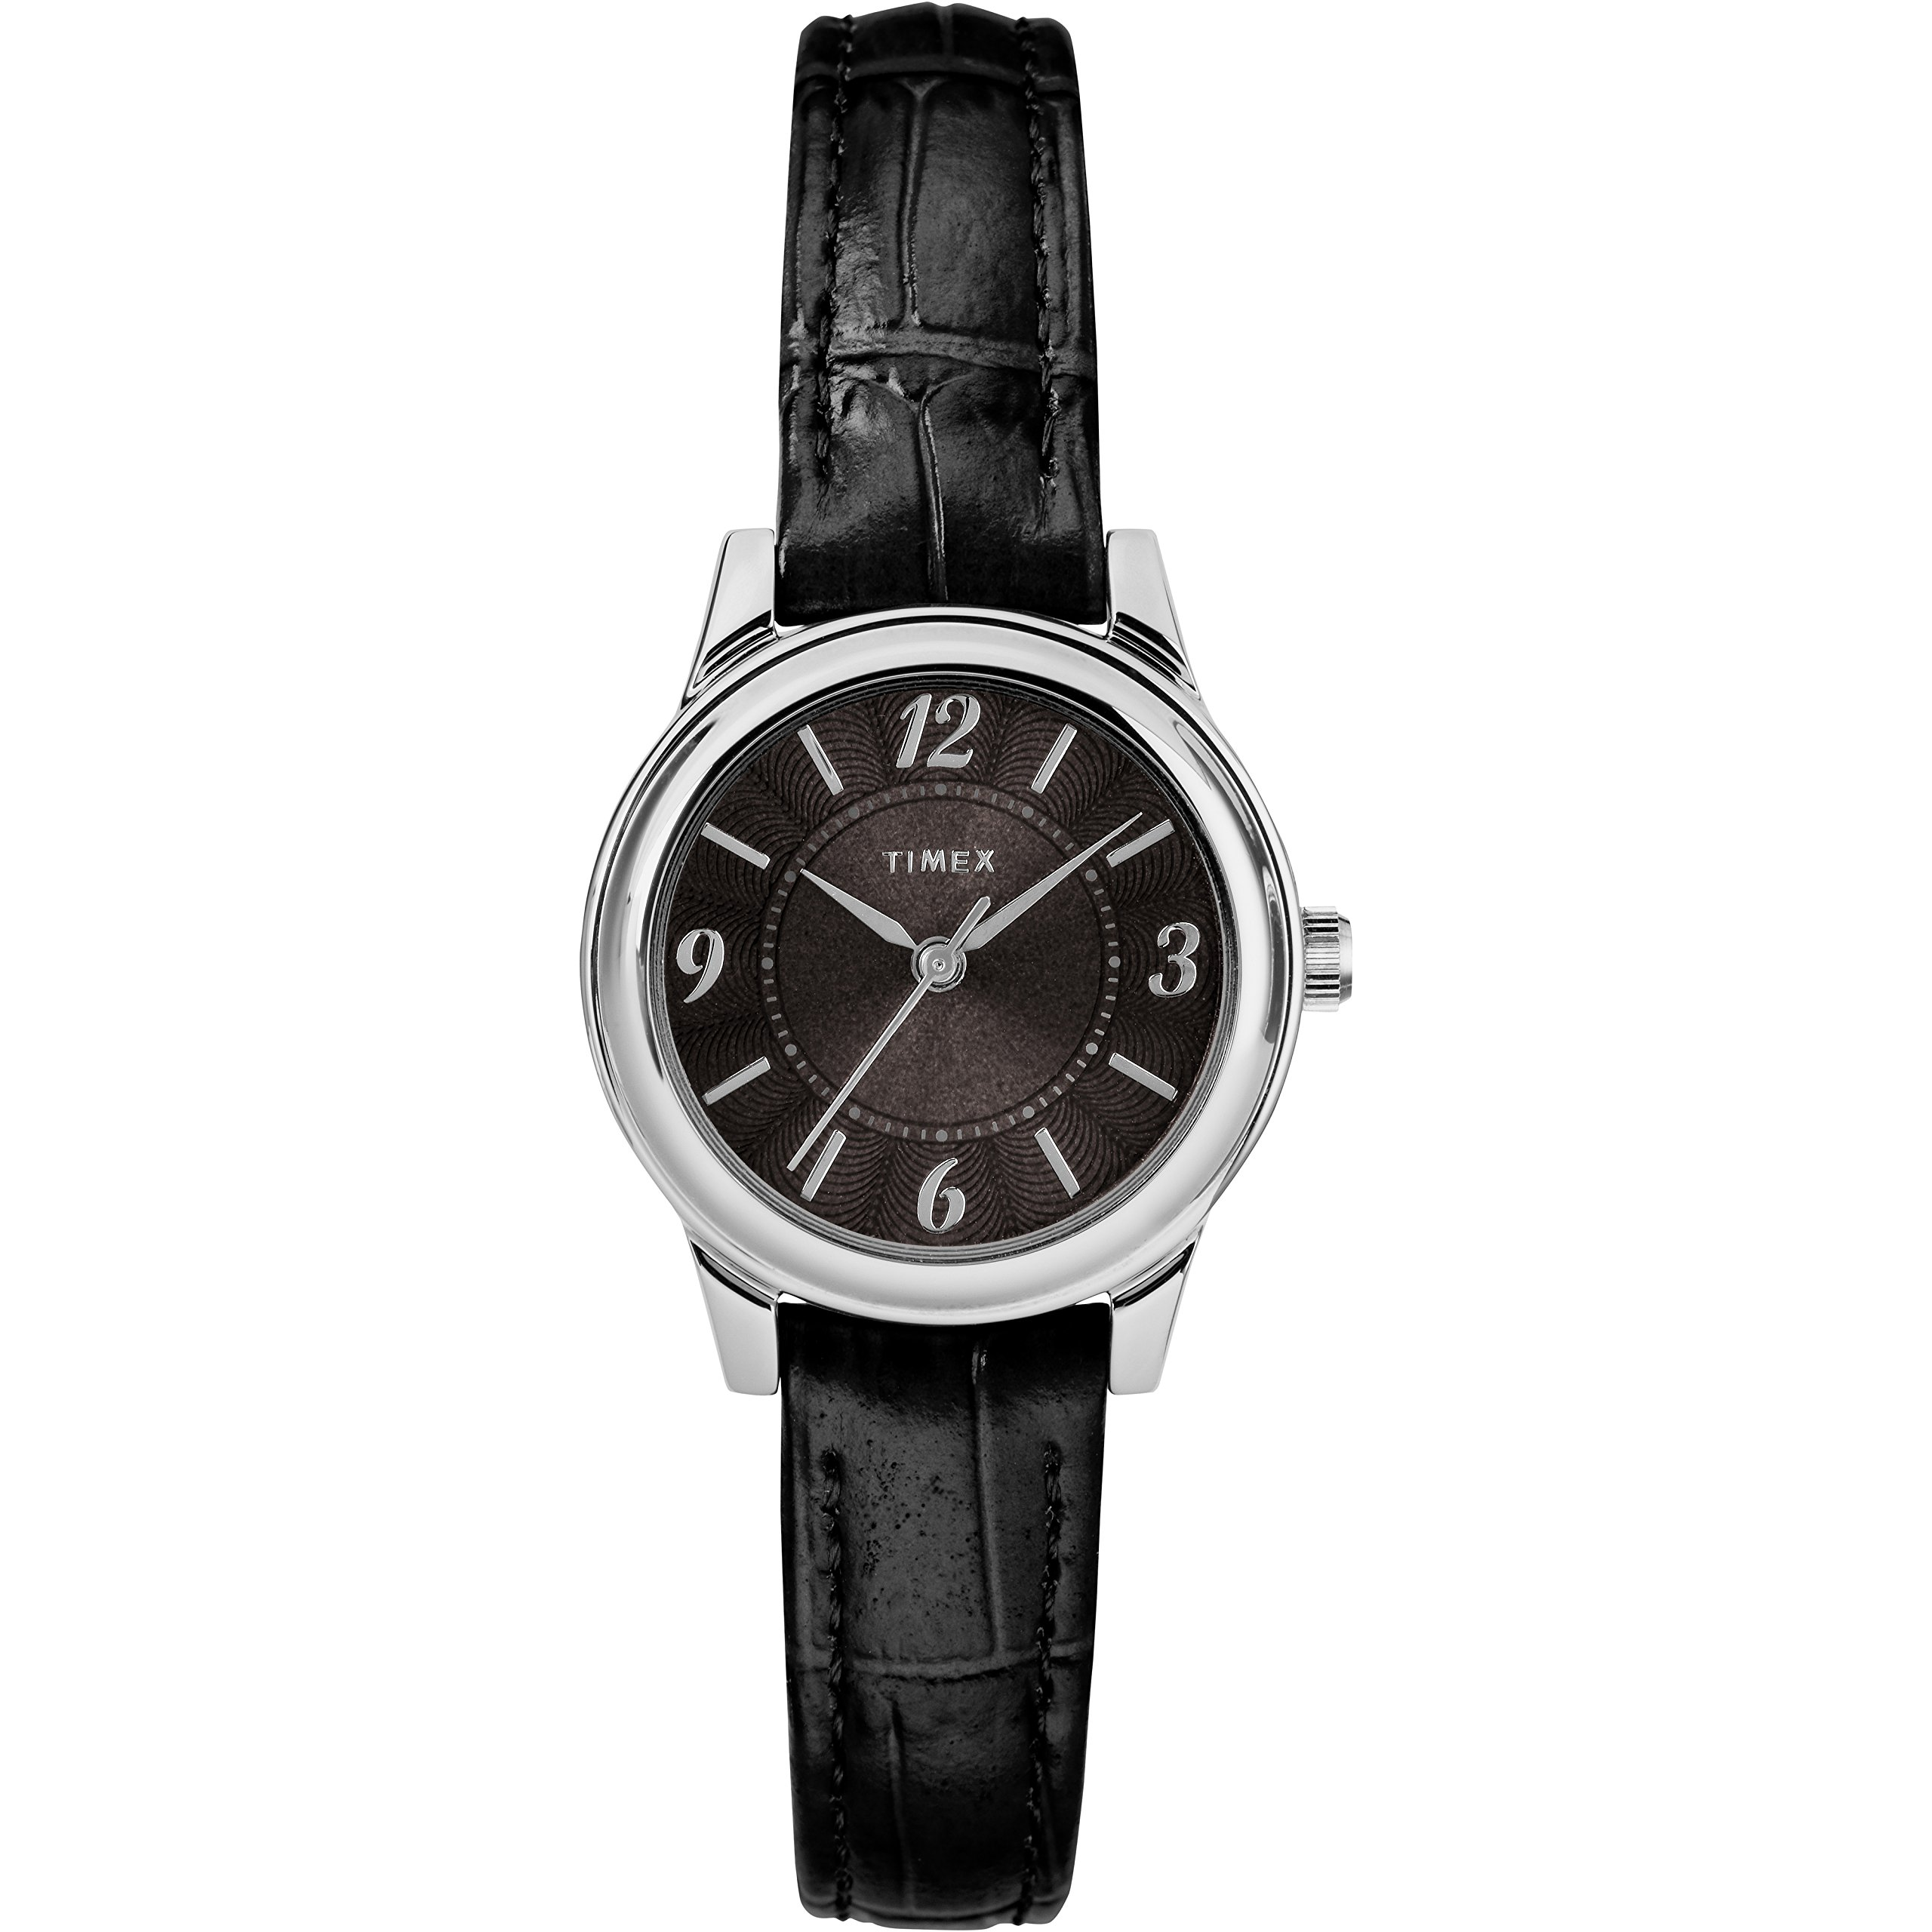 Timex Women's TW2R86300 Basics 26mm Black/Silver-Tone Croco Pattern Leather Strap Watch